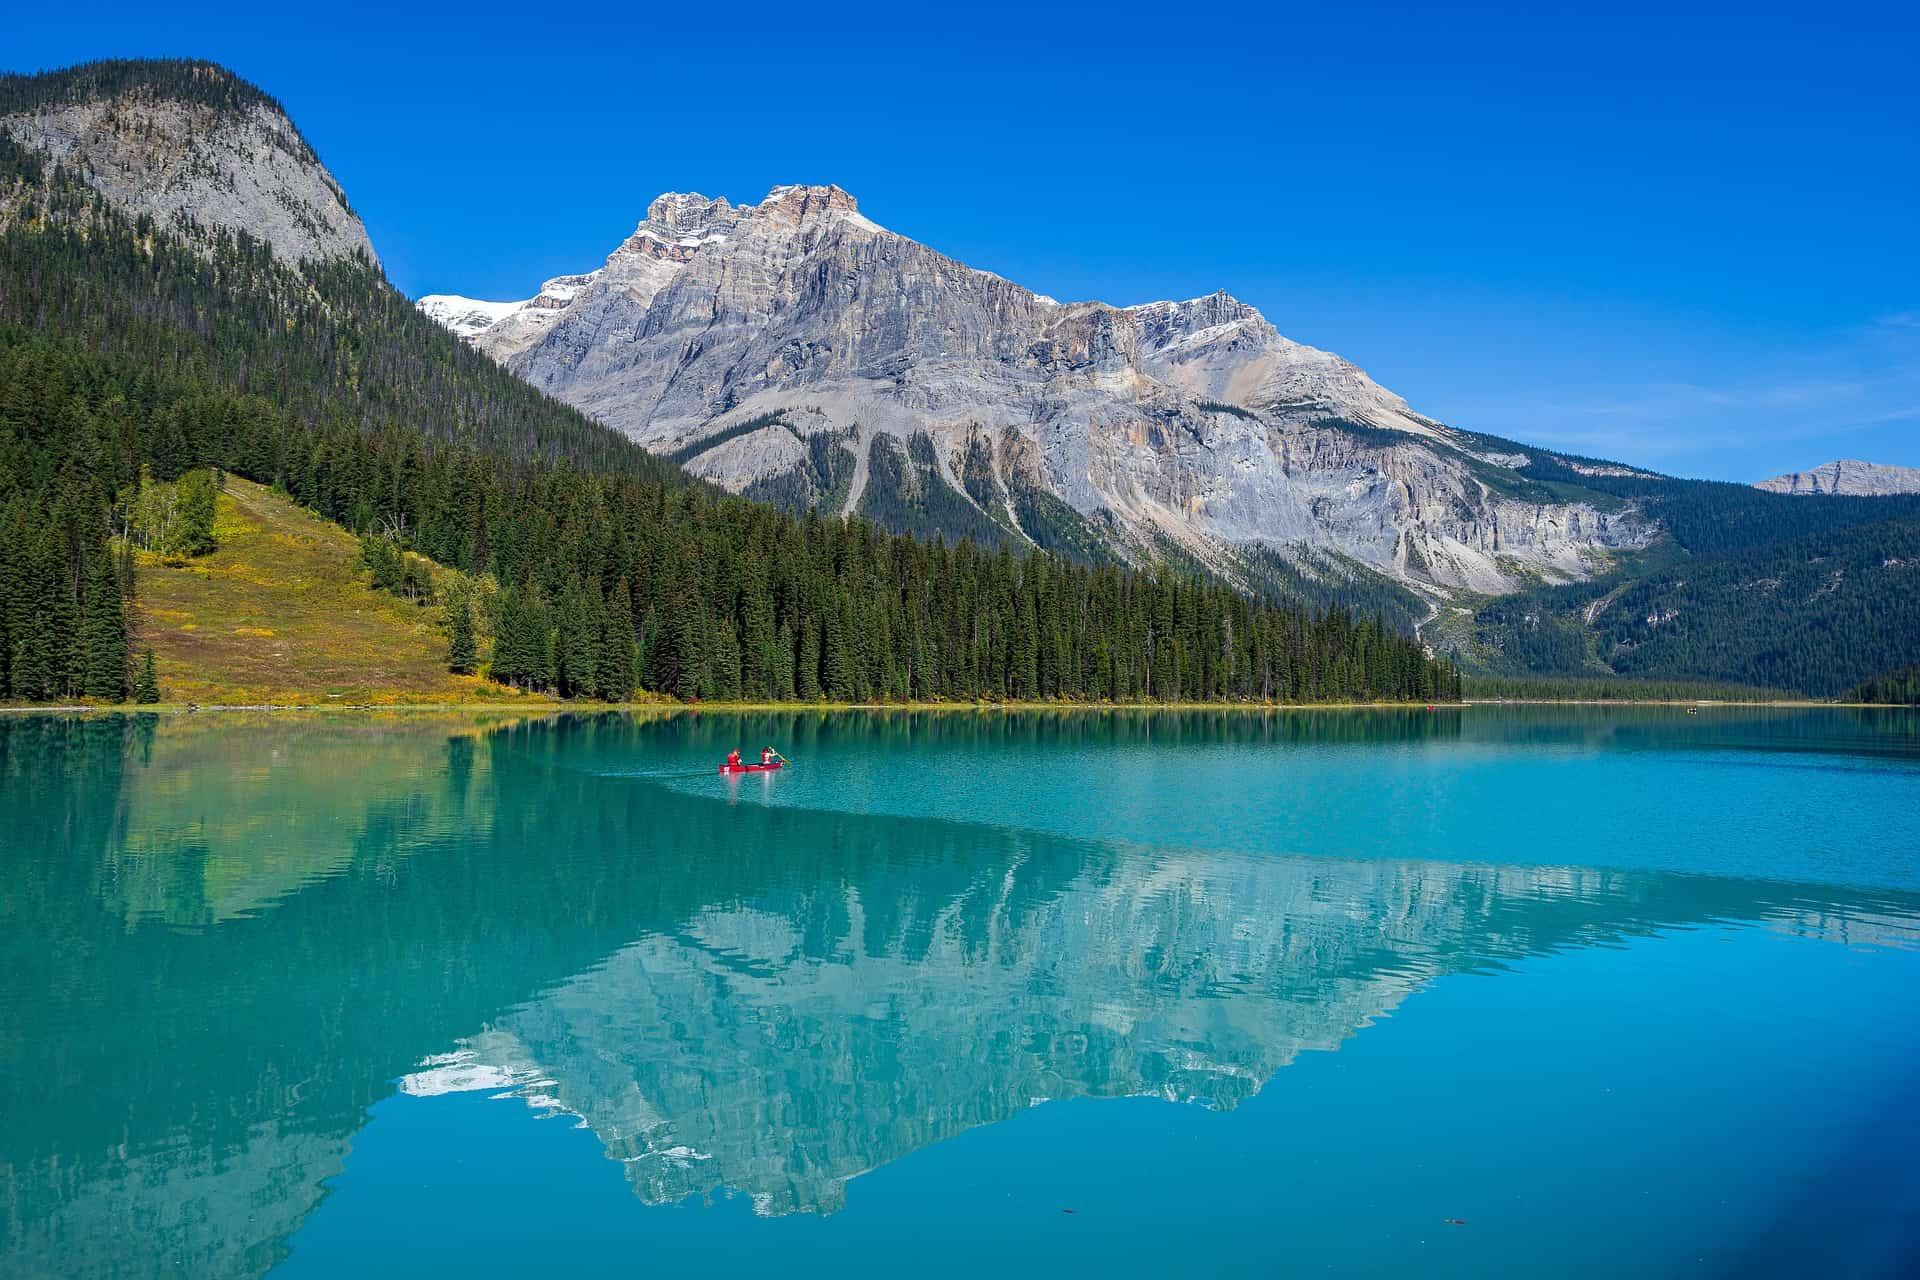 emerald-lake-5688356_1920